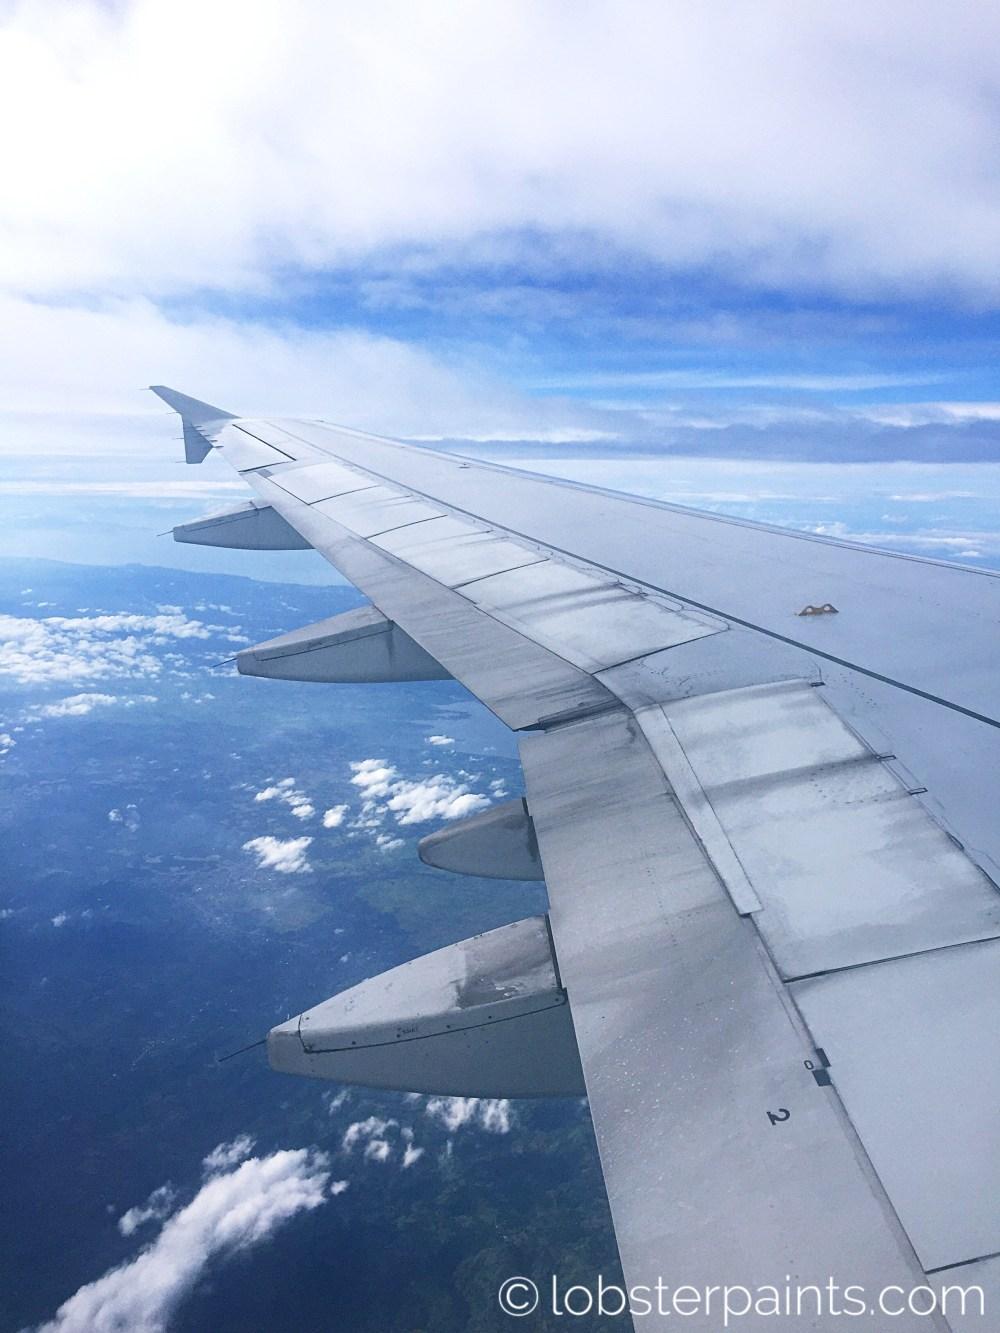 14 October 2015: Flight Catanduanes to Manila